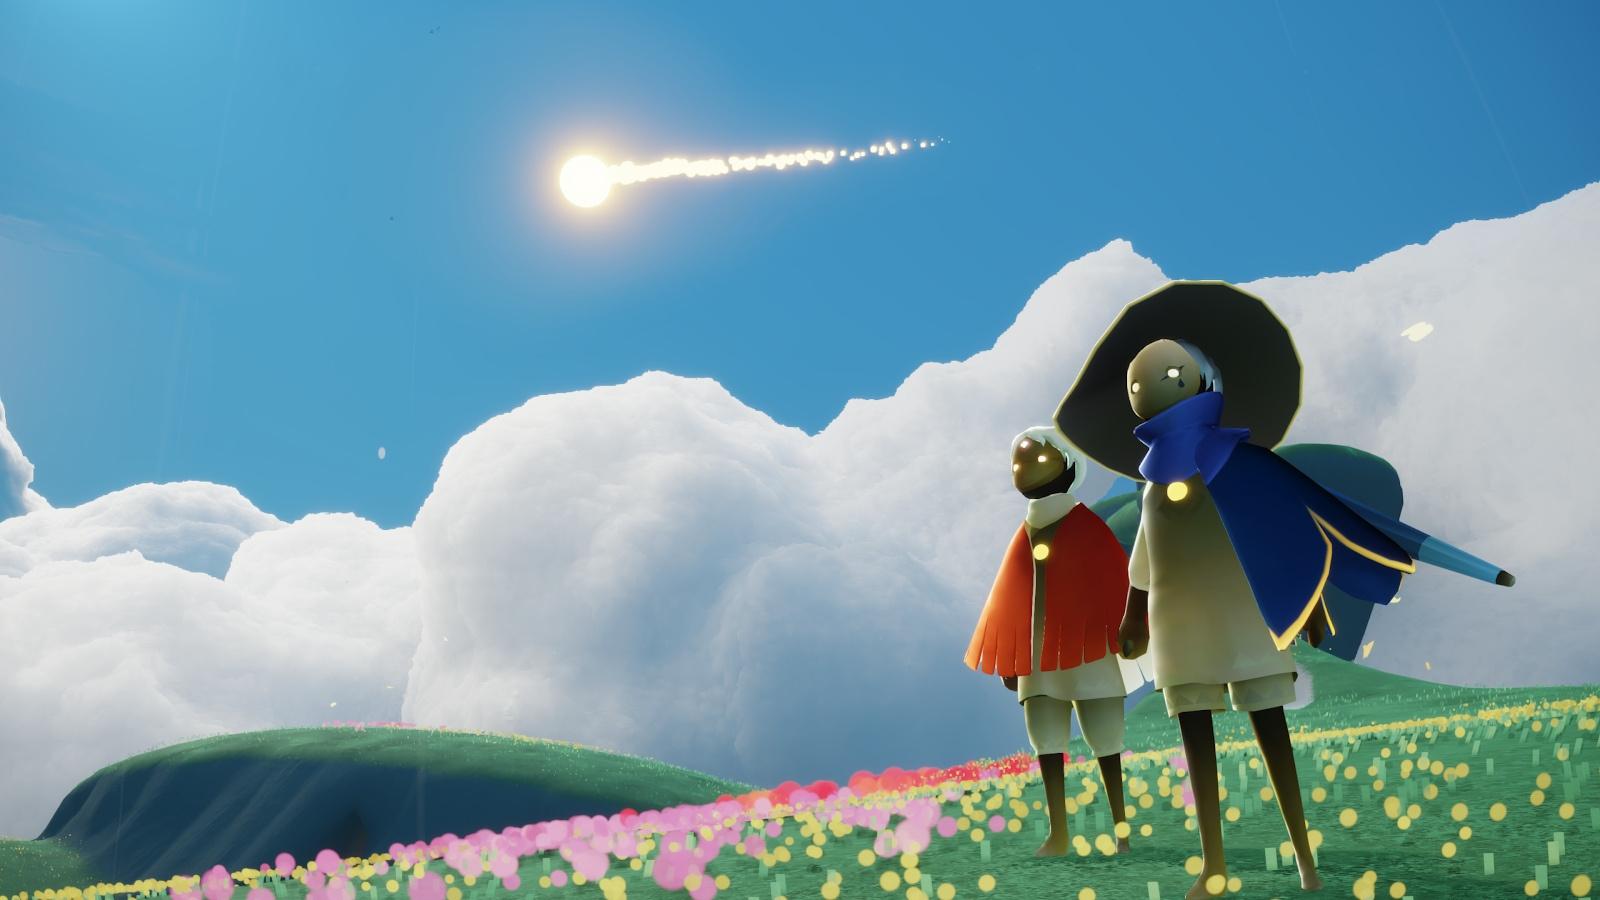 Sky: Children of the Light для Switch перенесли на 2021 год